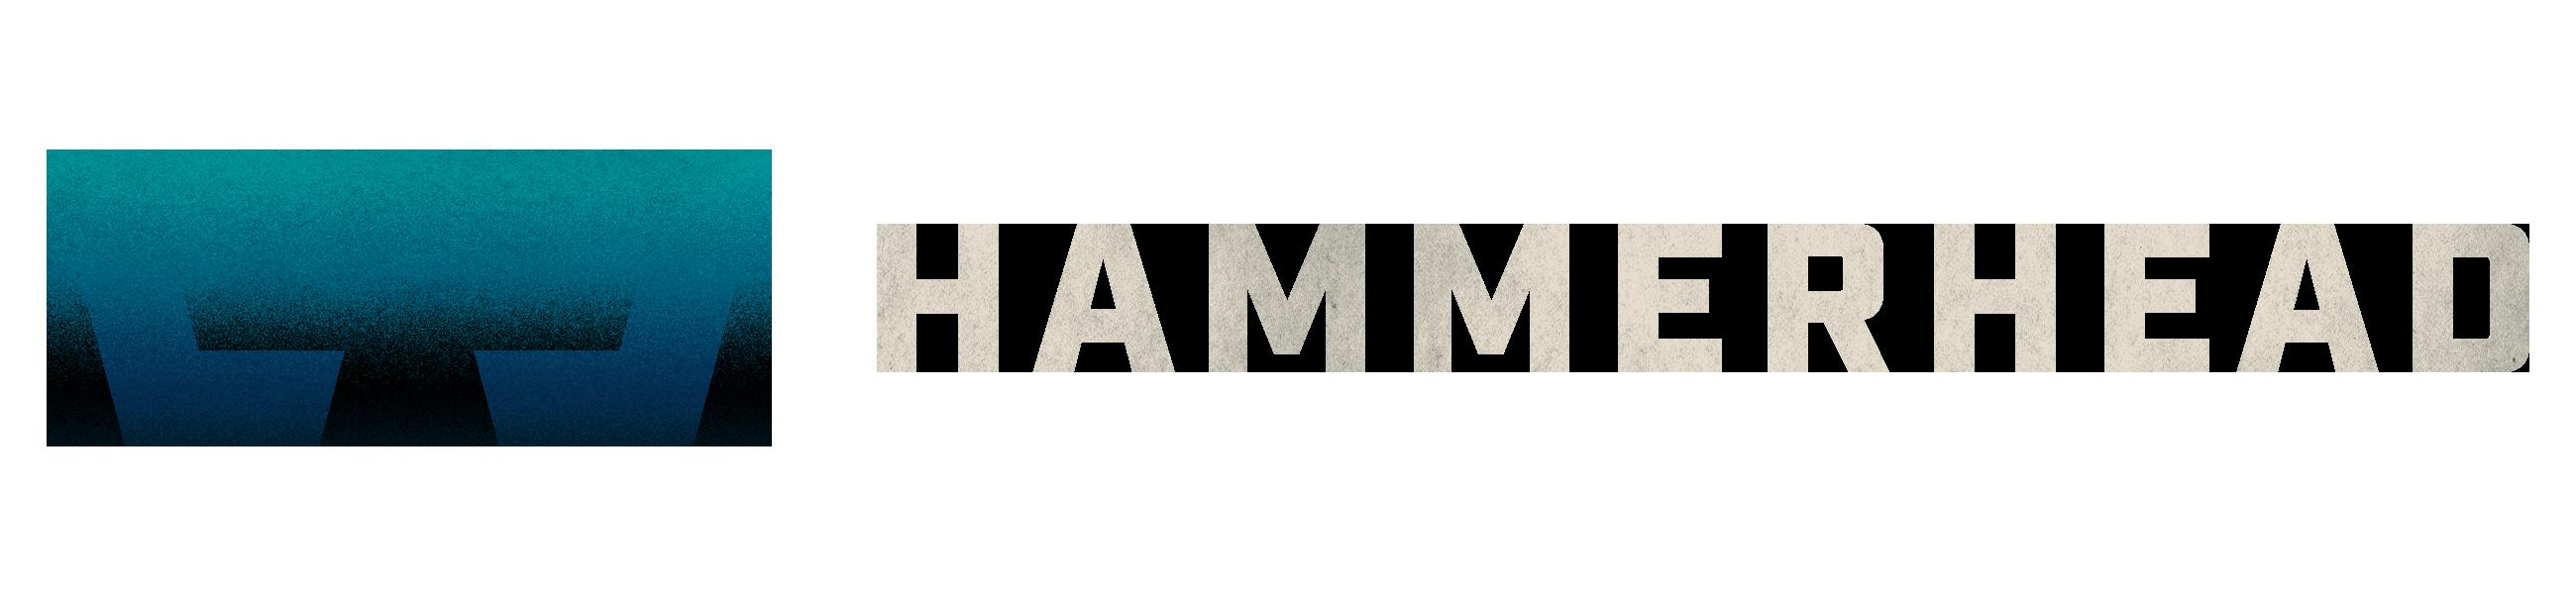 Hammerhead VR